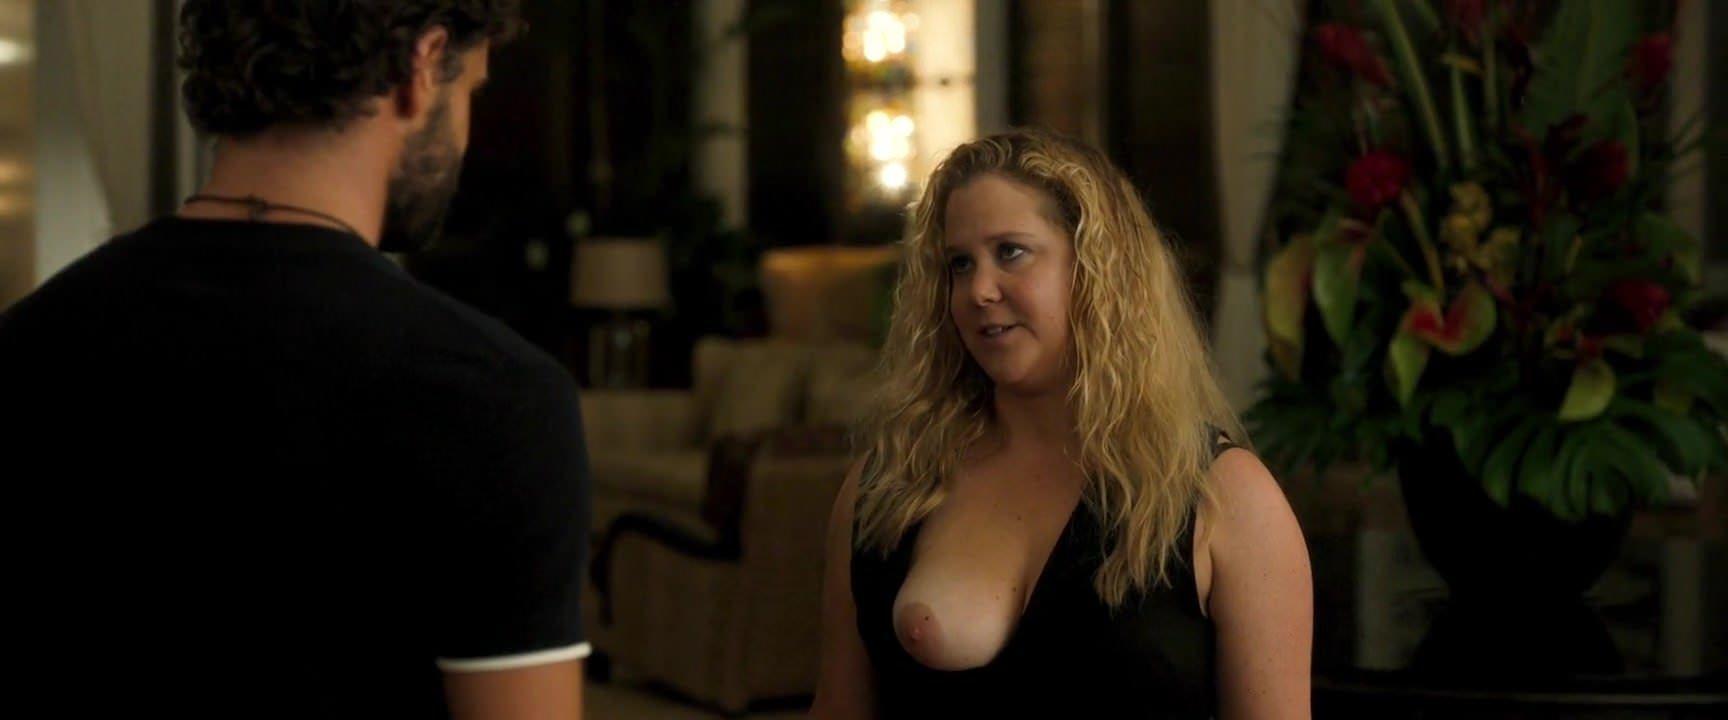 Amy Schumer Boobs Nude